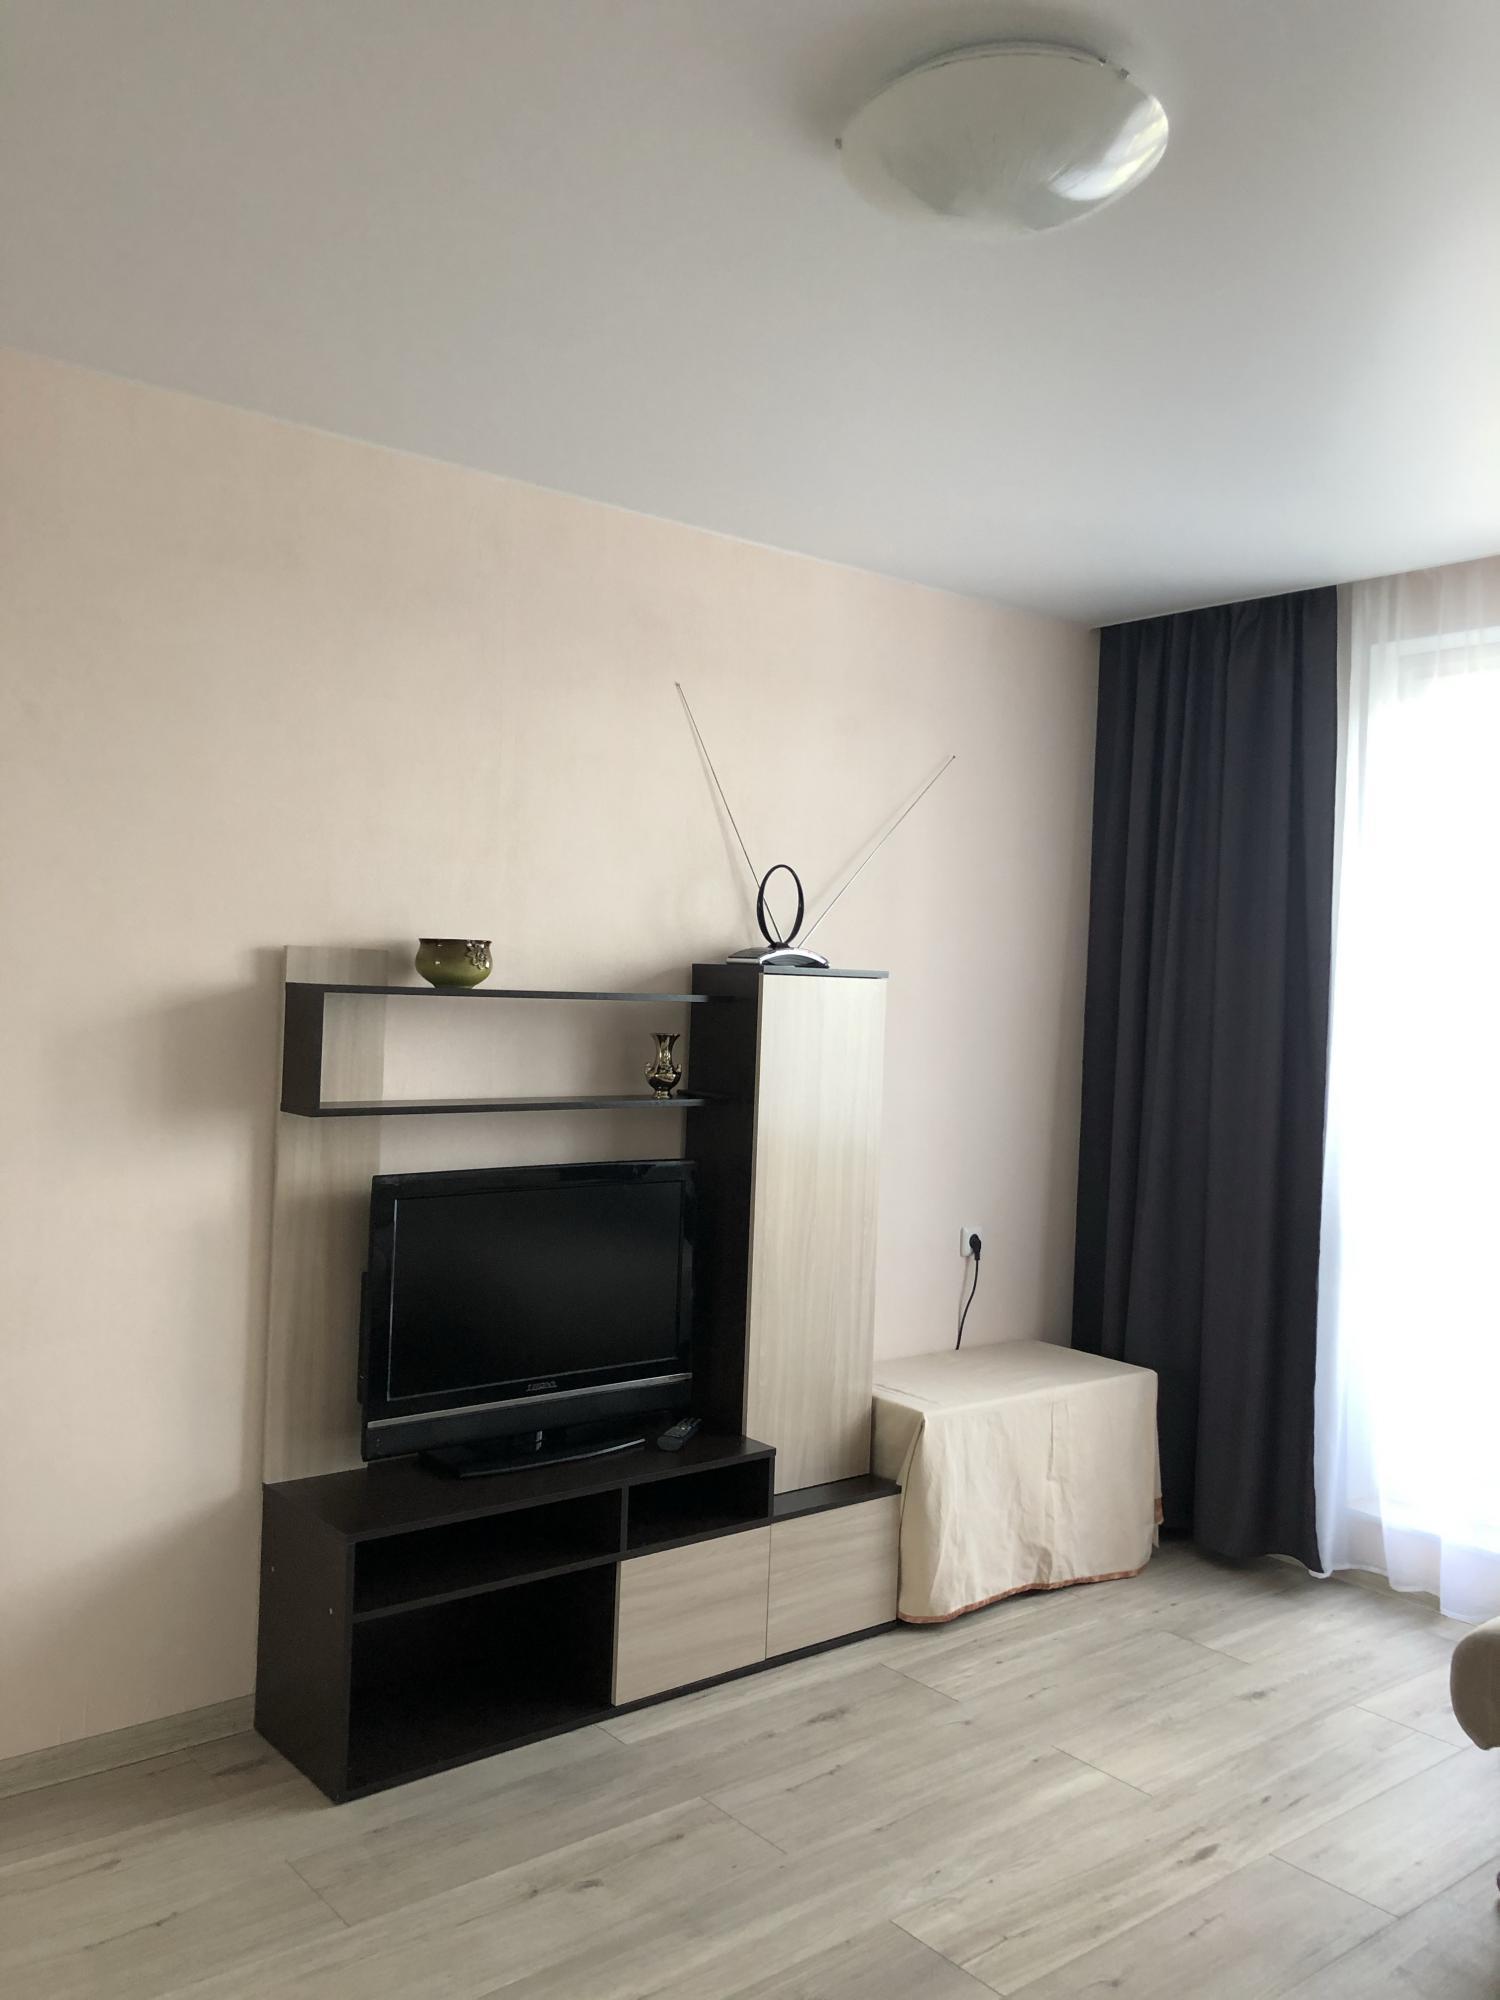 Квартира, 1 комната, 38.5 м² в Юбилейном 89261770666 купить 3